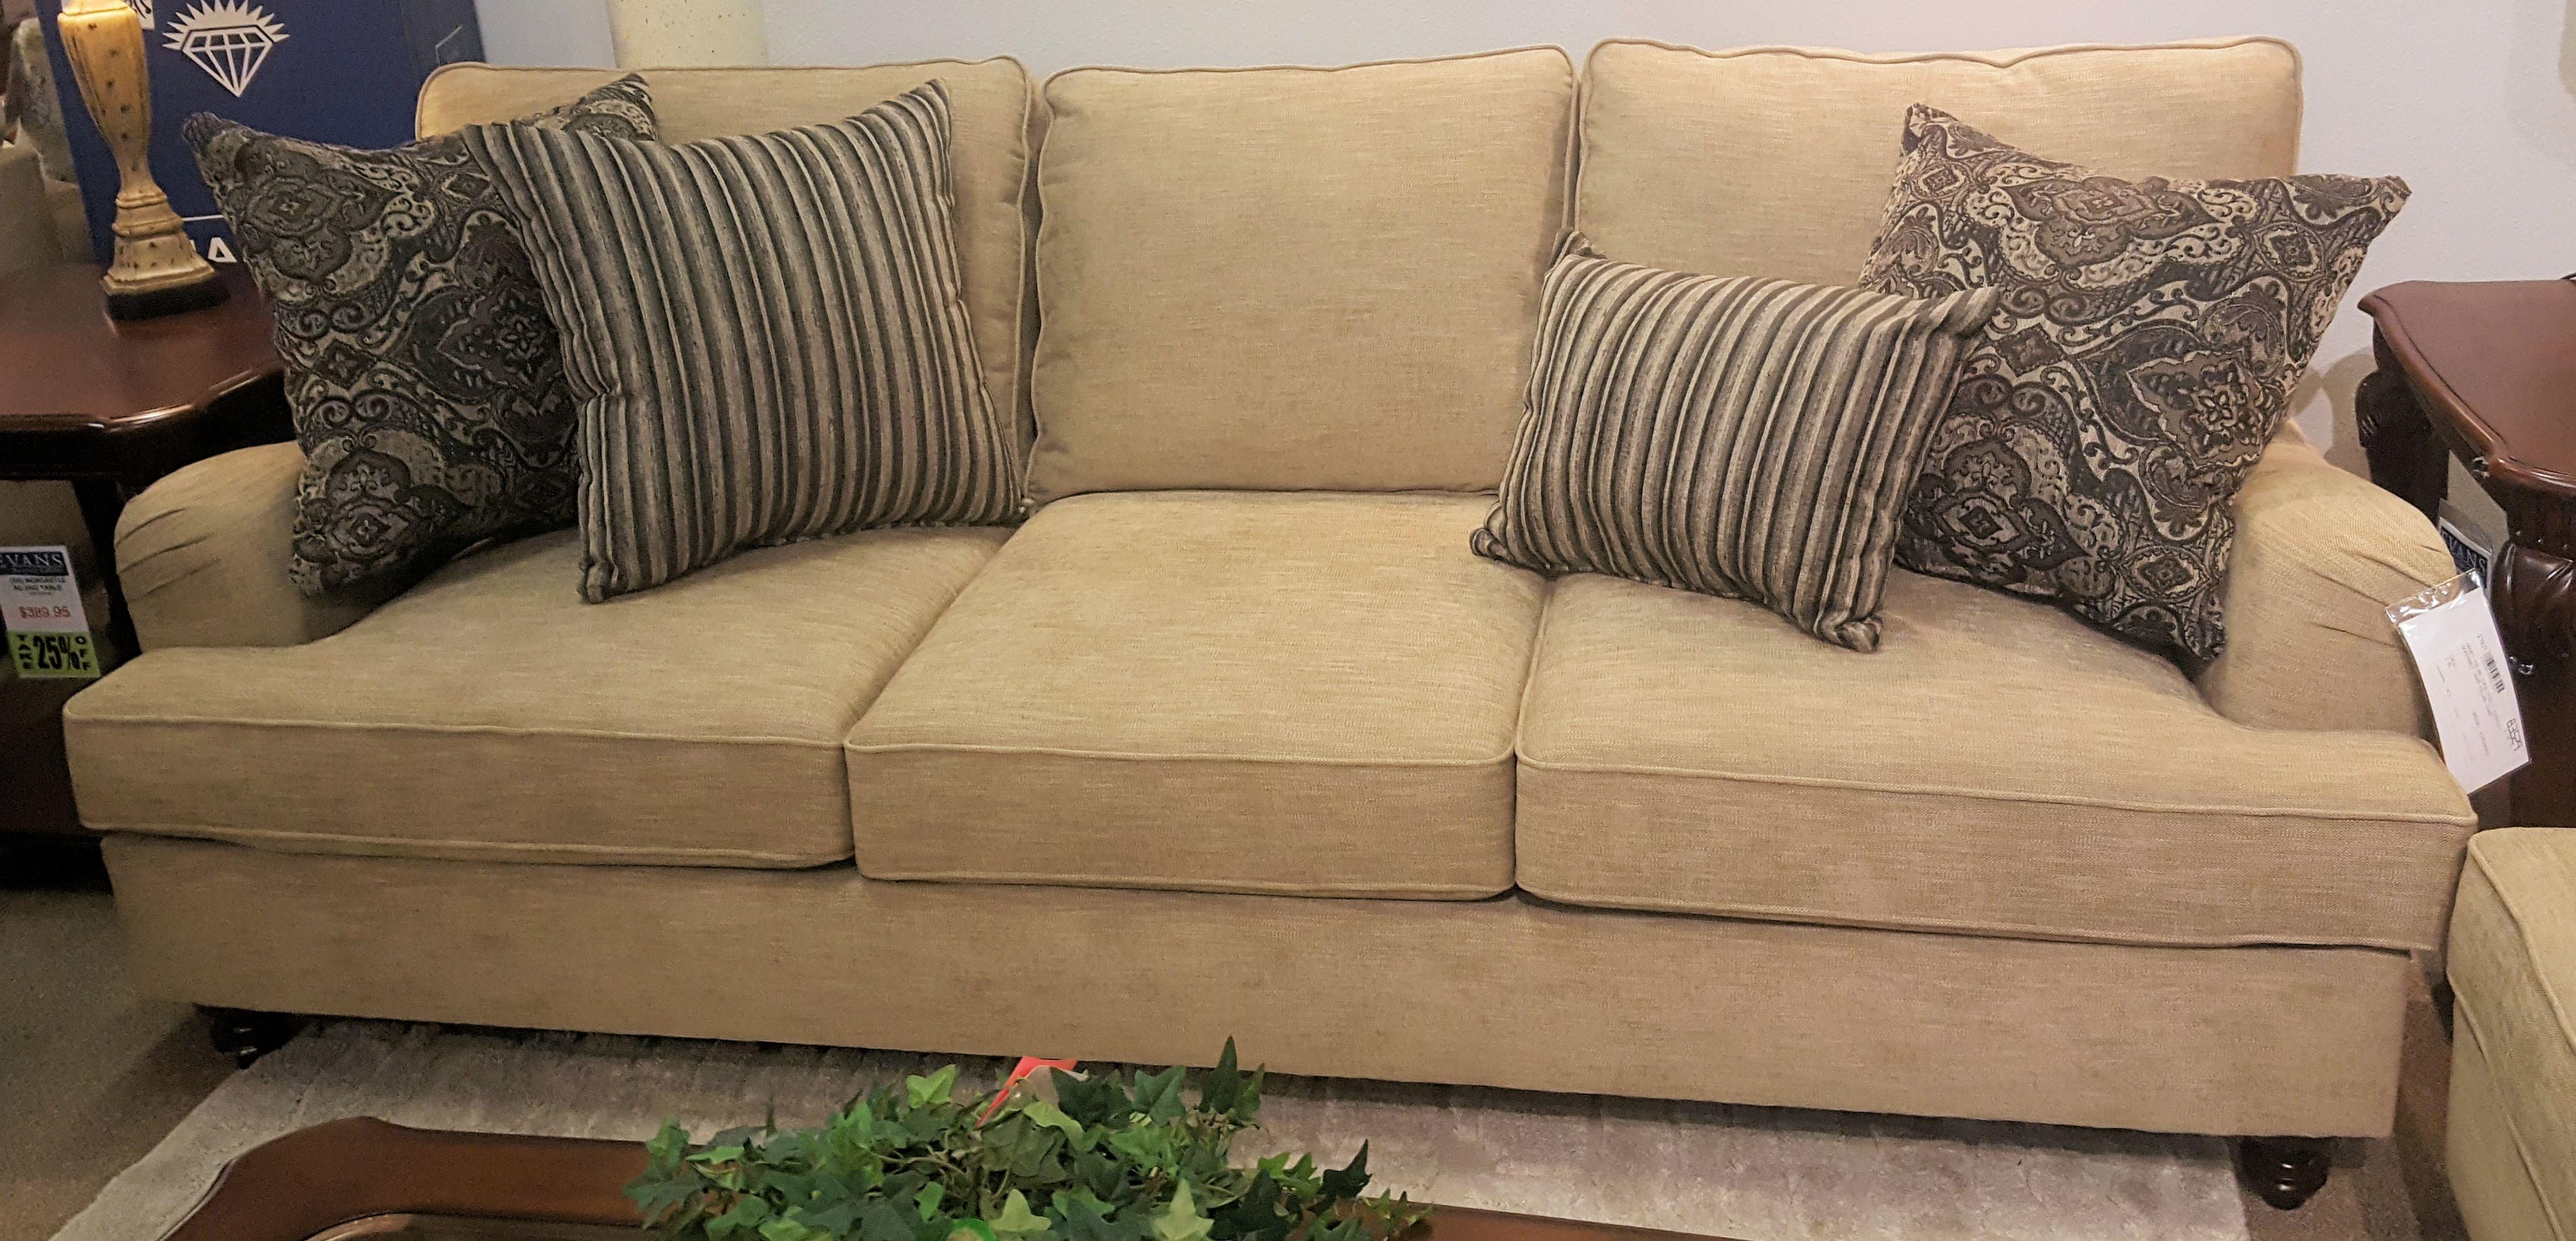 Henry Laine Living Room Sofa 8178900 At Evans Furniture Galleries